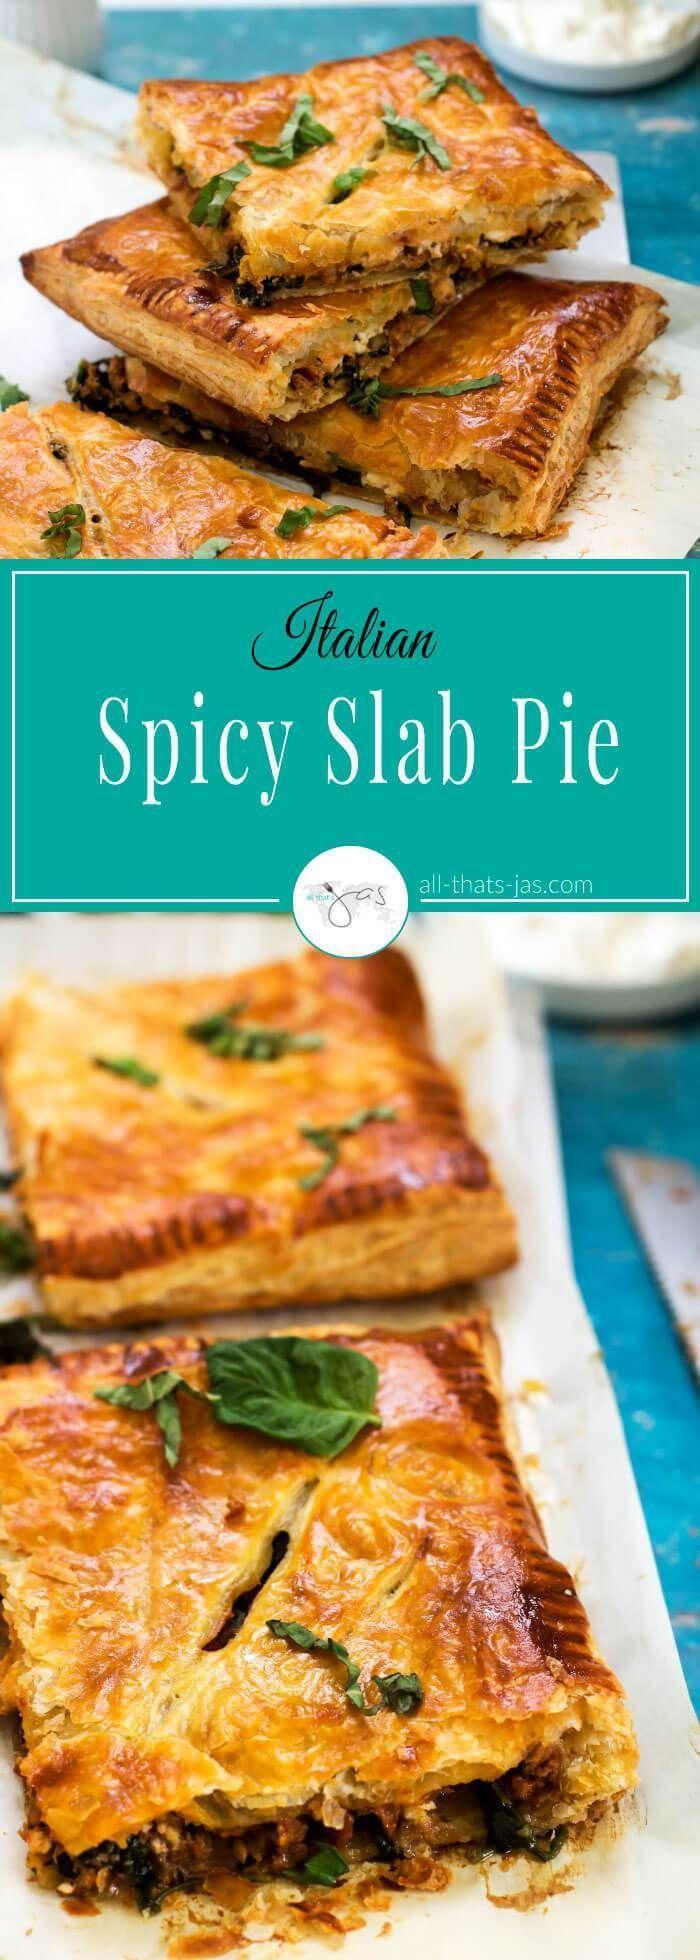 48 best BLISS BOWLS images on Pinterest | Cooking food, Vegan ...